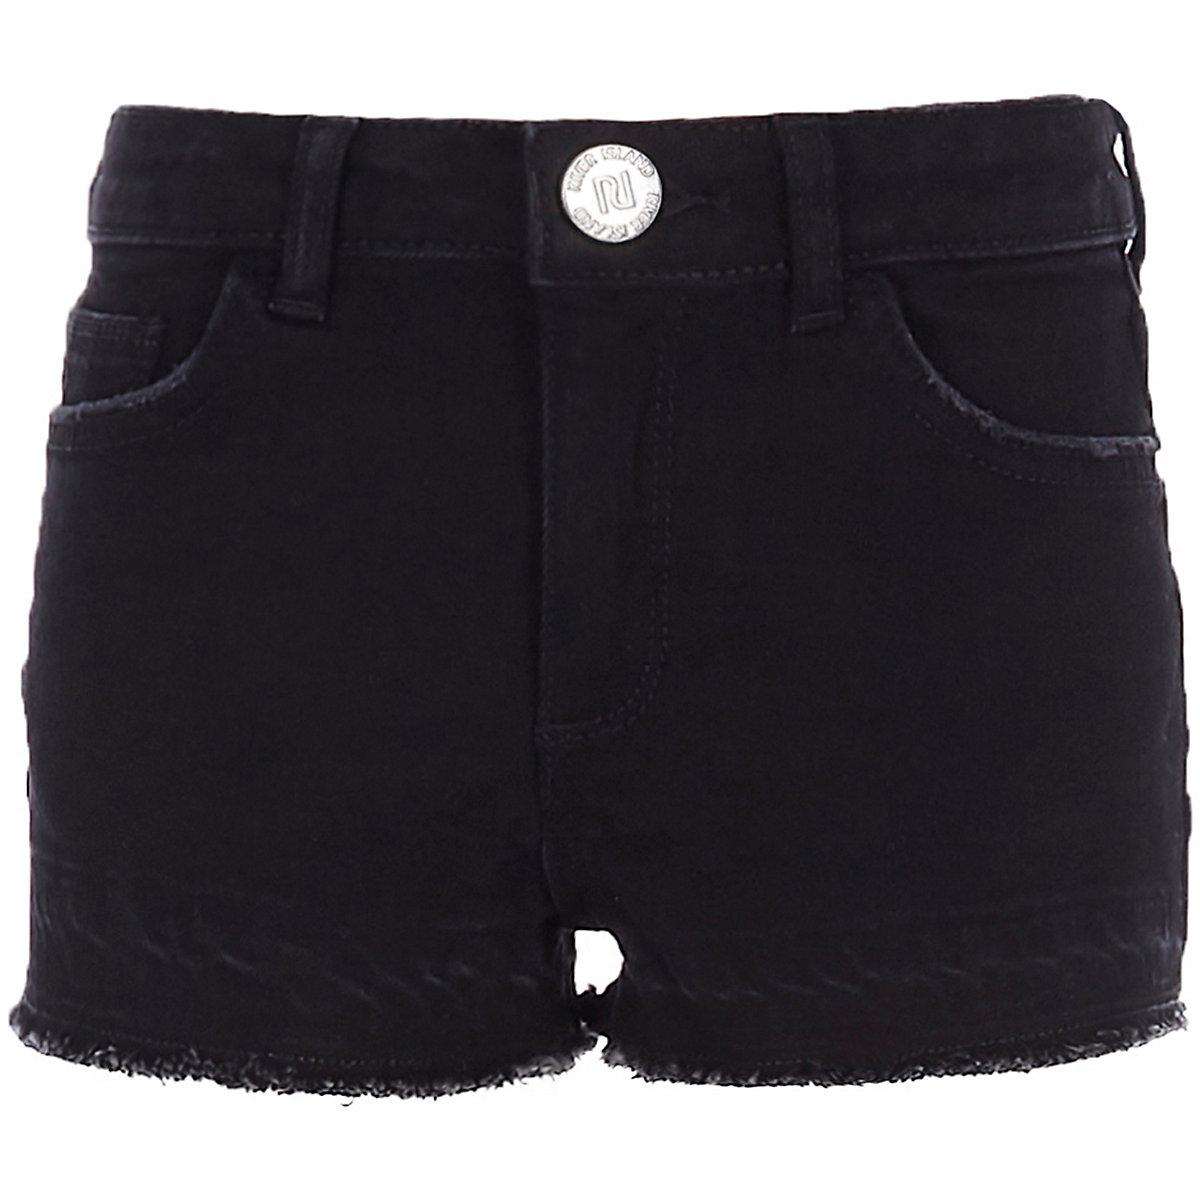 Girls black boyfriend shorts